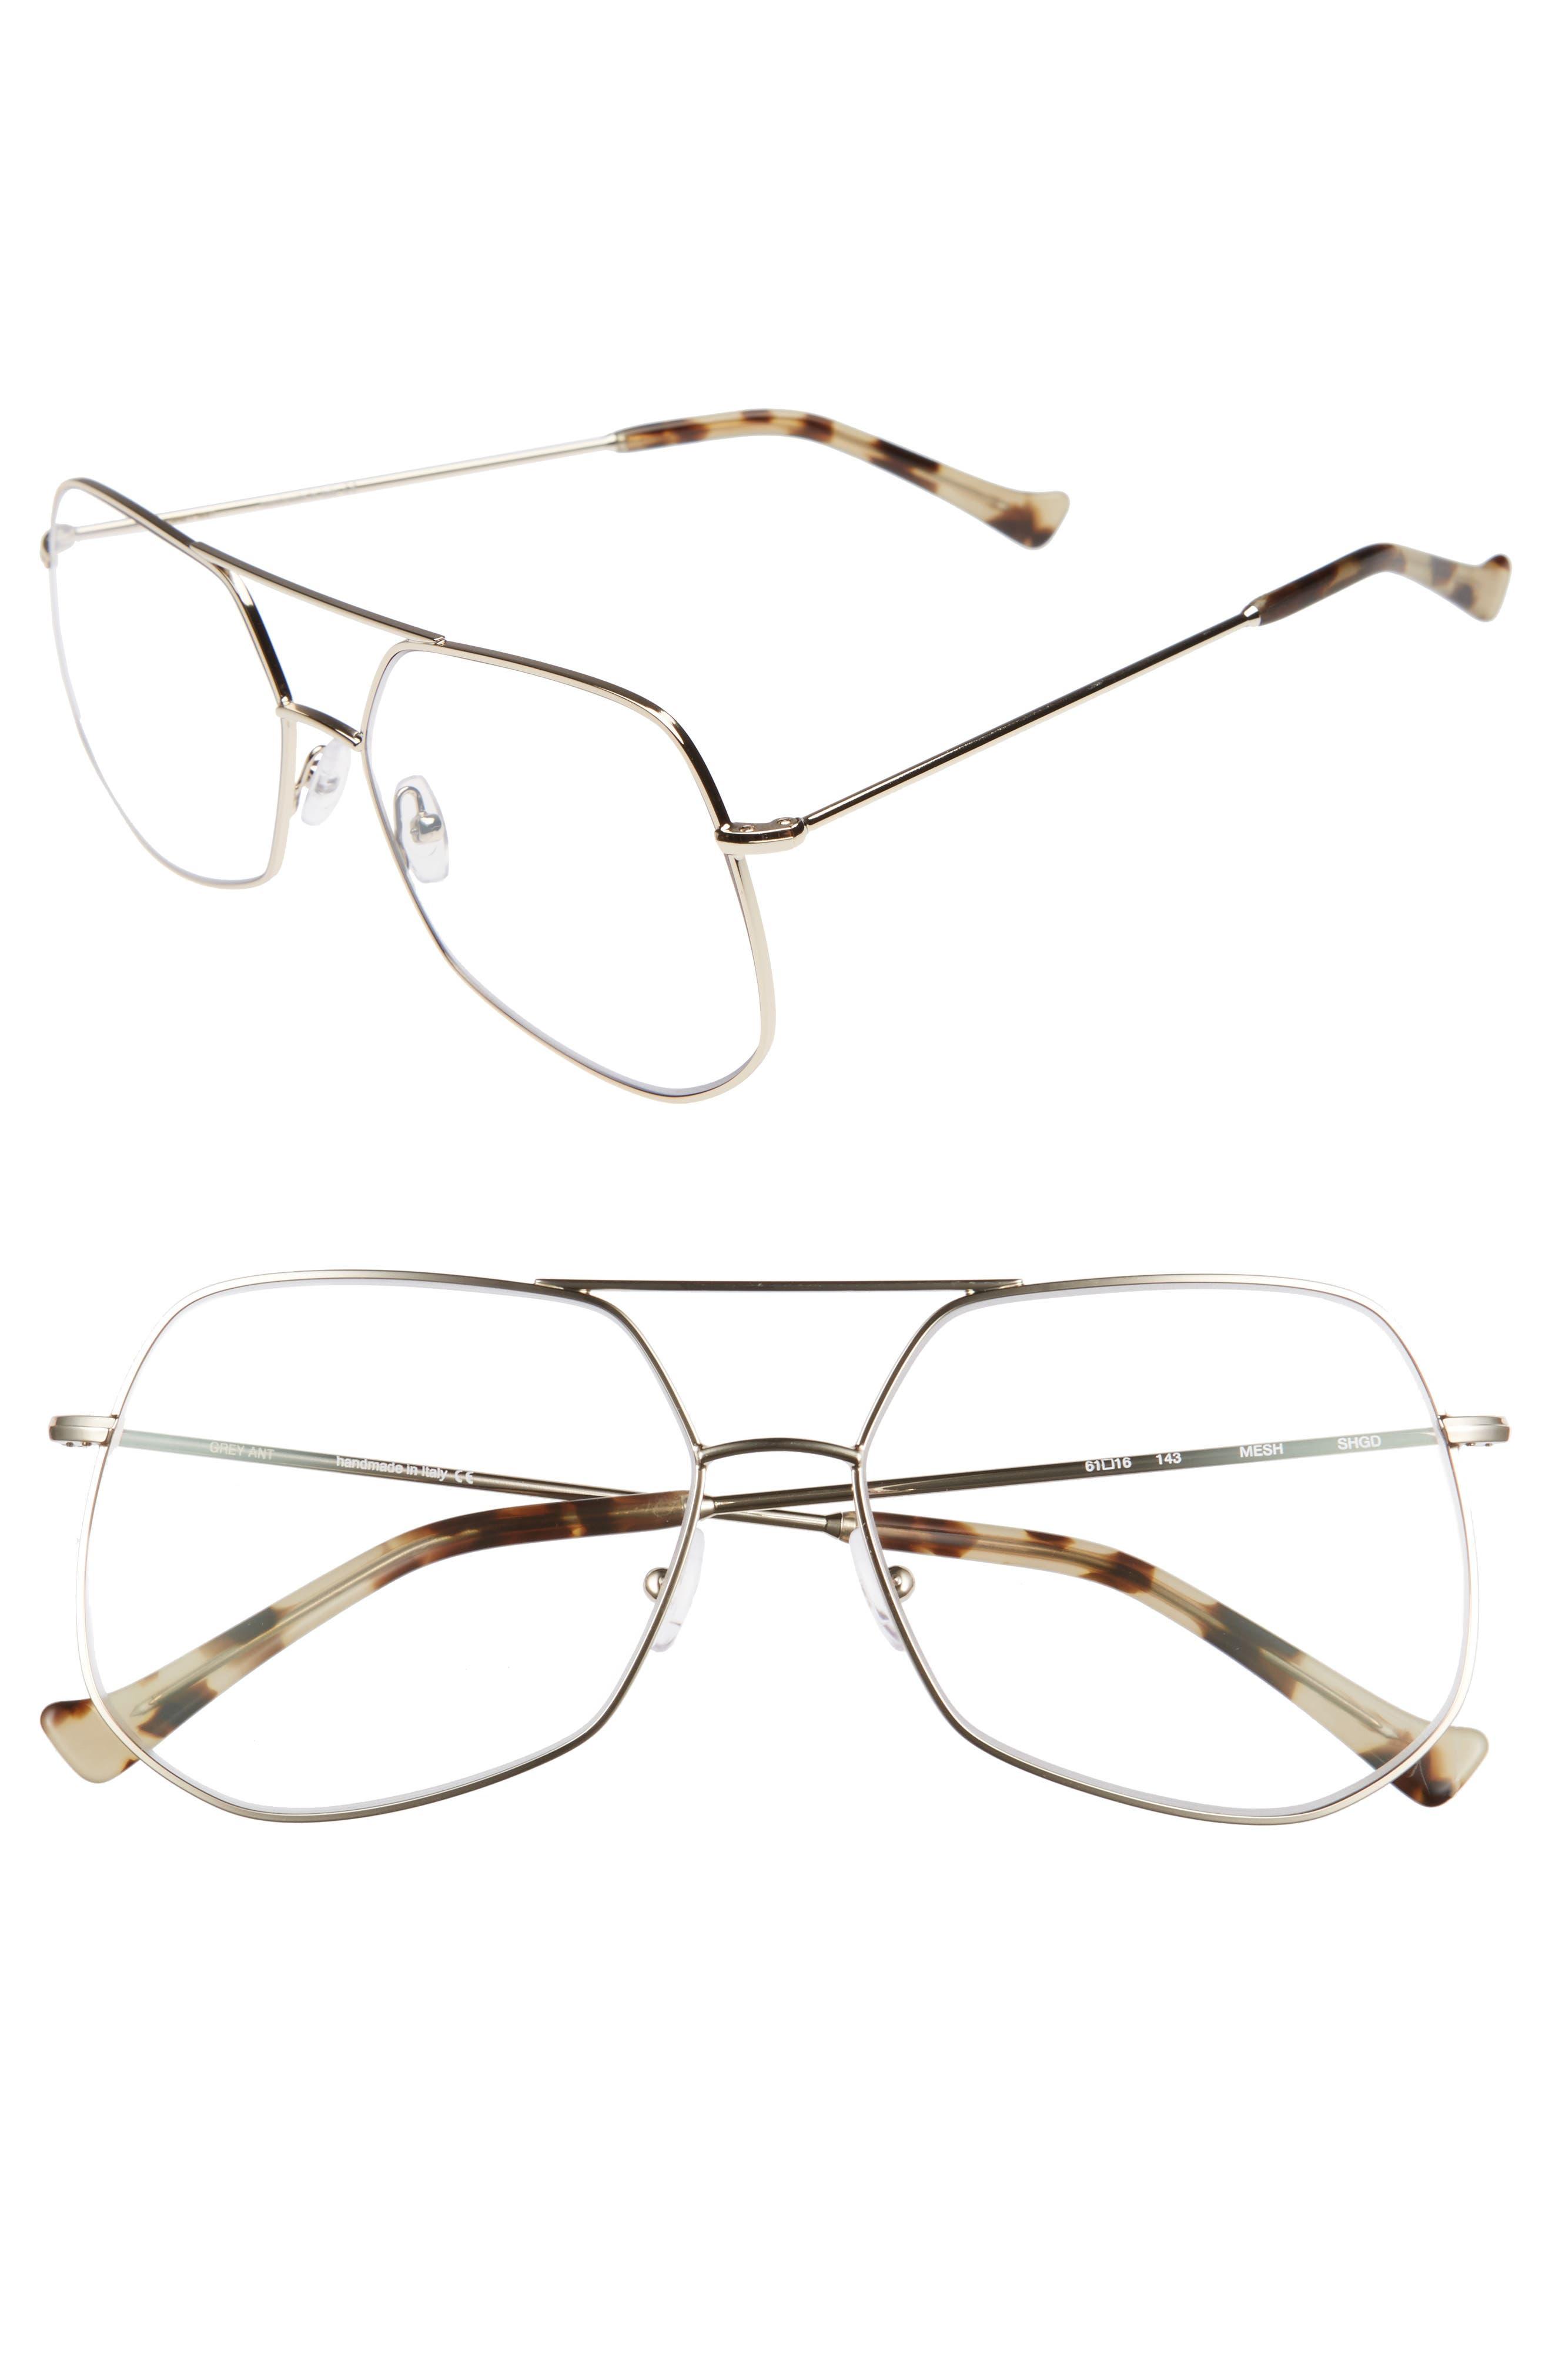 Mesh 61mm Optical Glasses,                             Main thumbnail 1, color,                             Gold